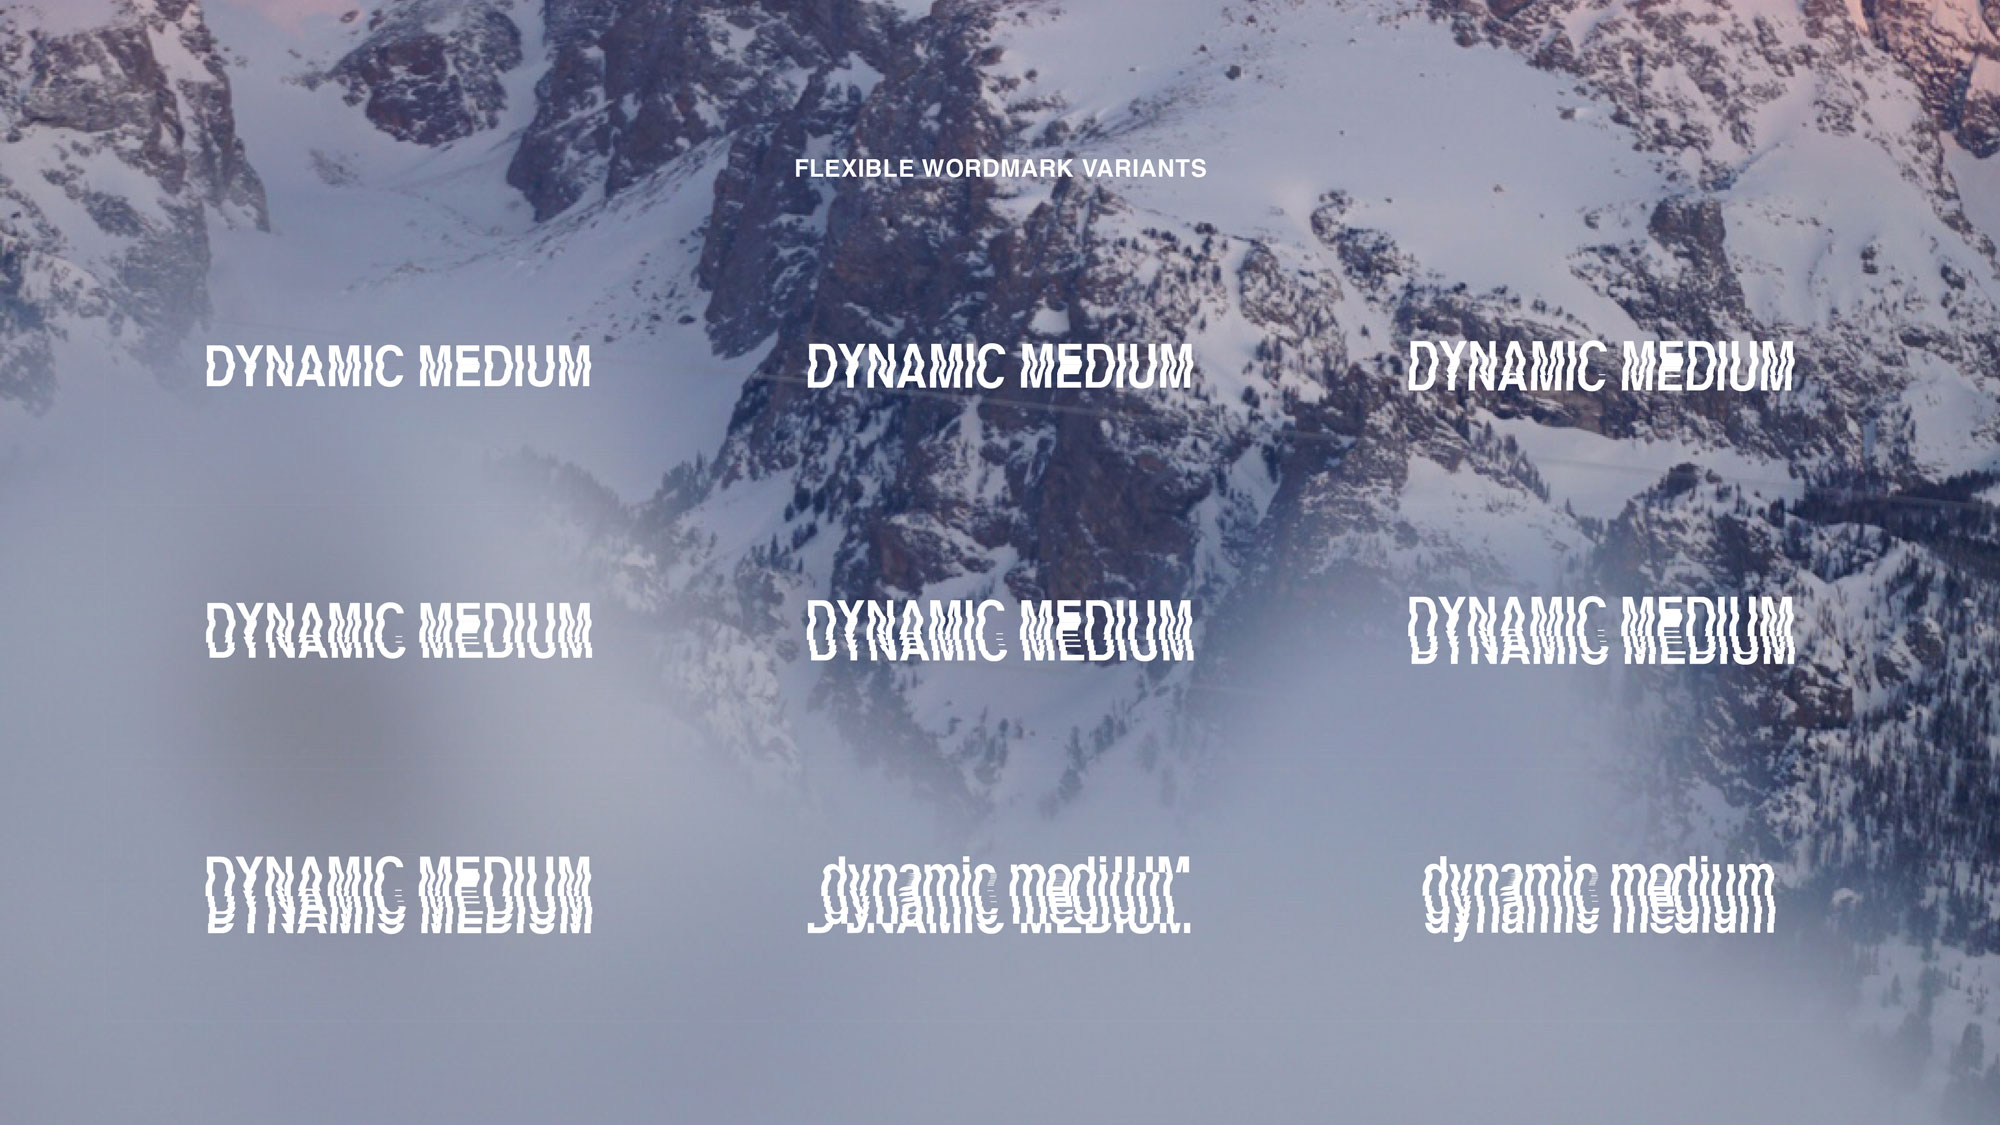 DynamicMedium-Branding-Style-Guide3